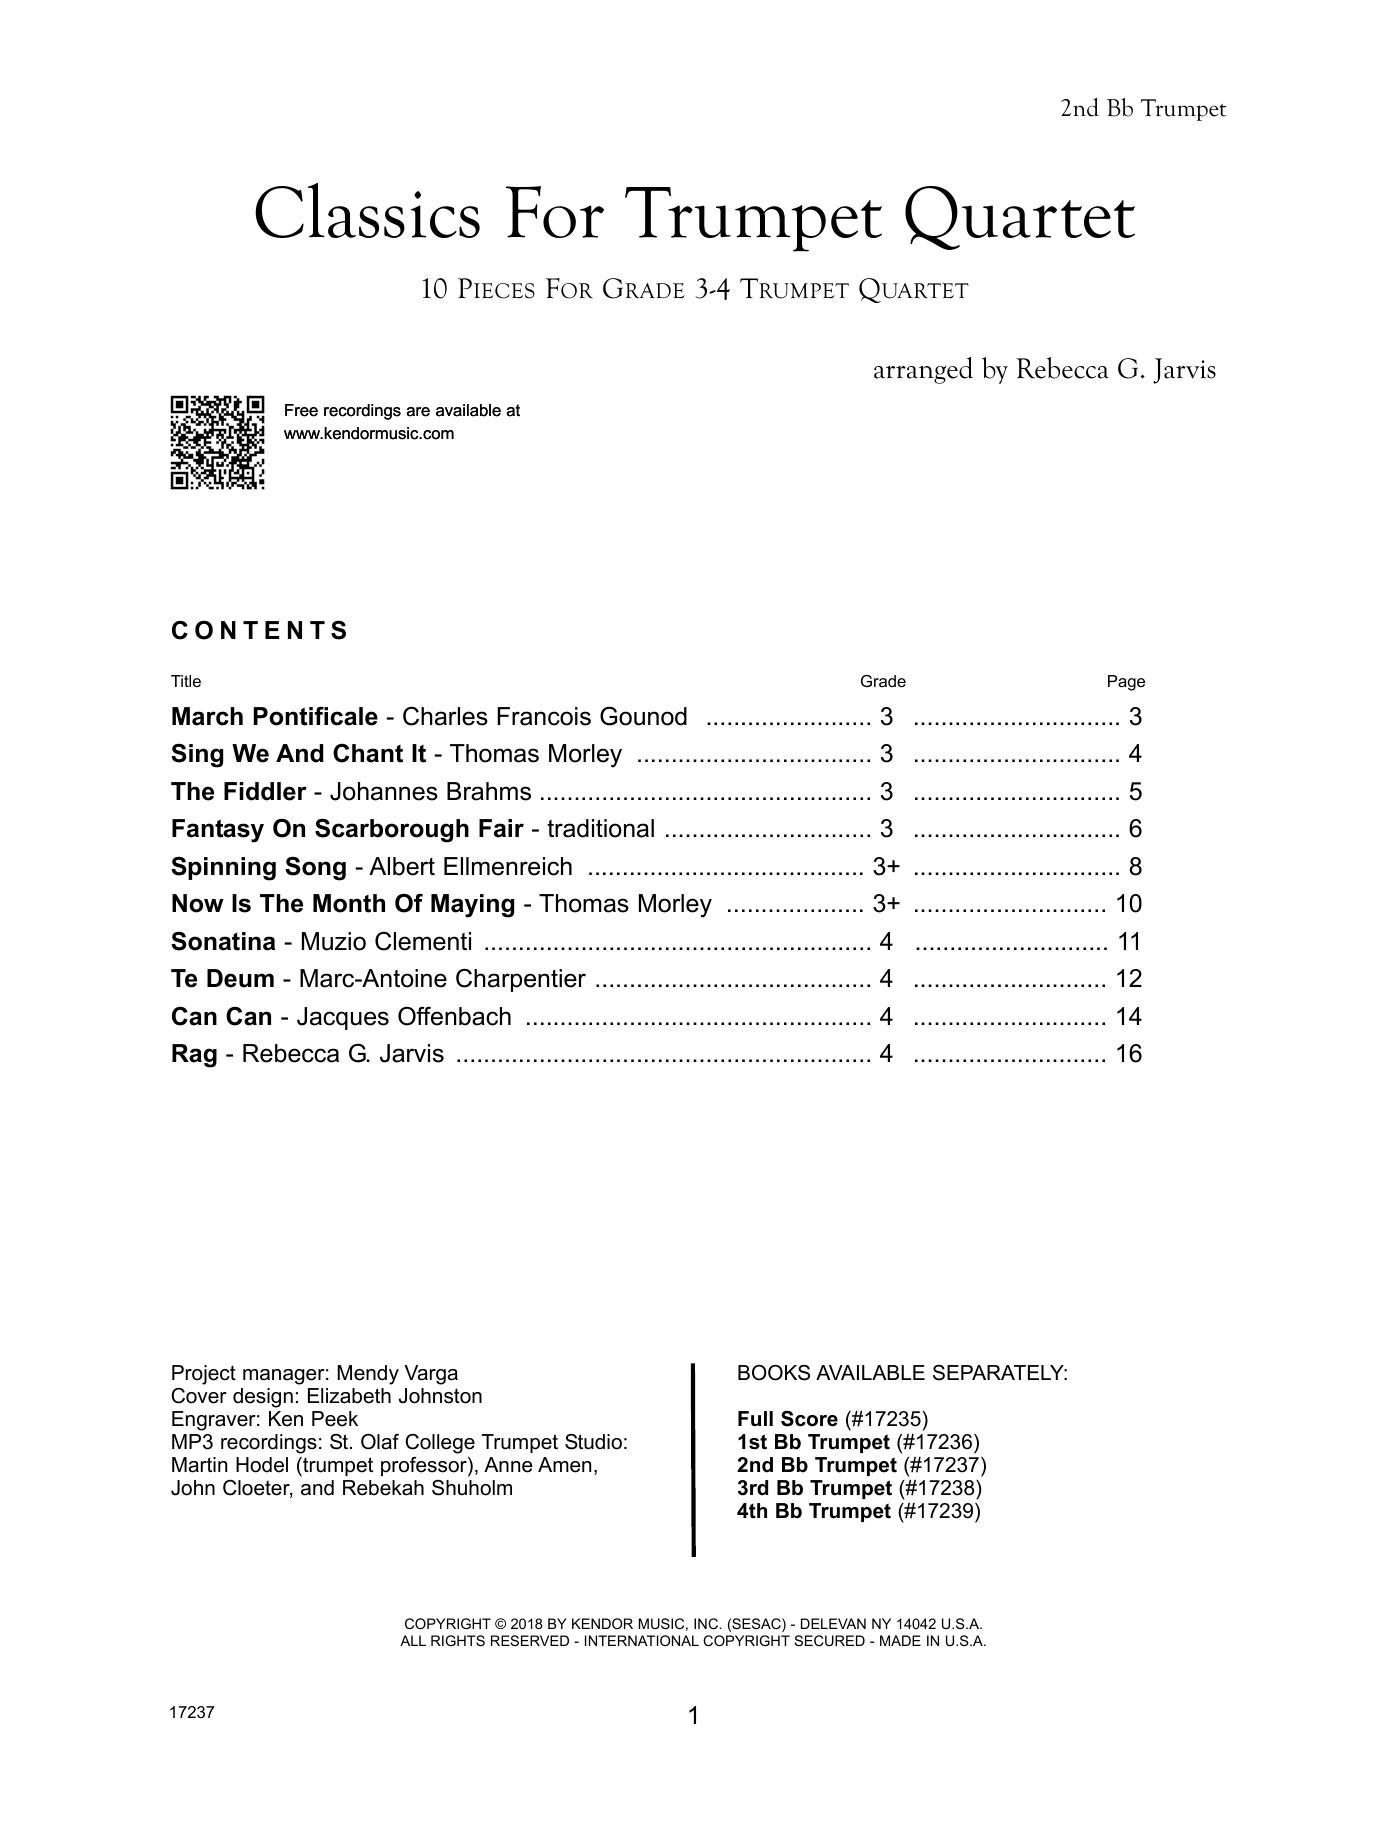 Classics For Trumpet Quartet - 2nd Trumpet Sheet Music